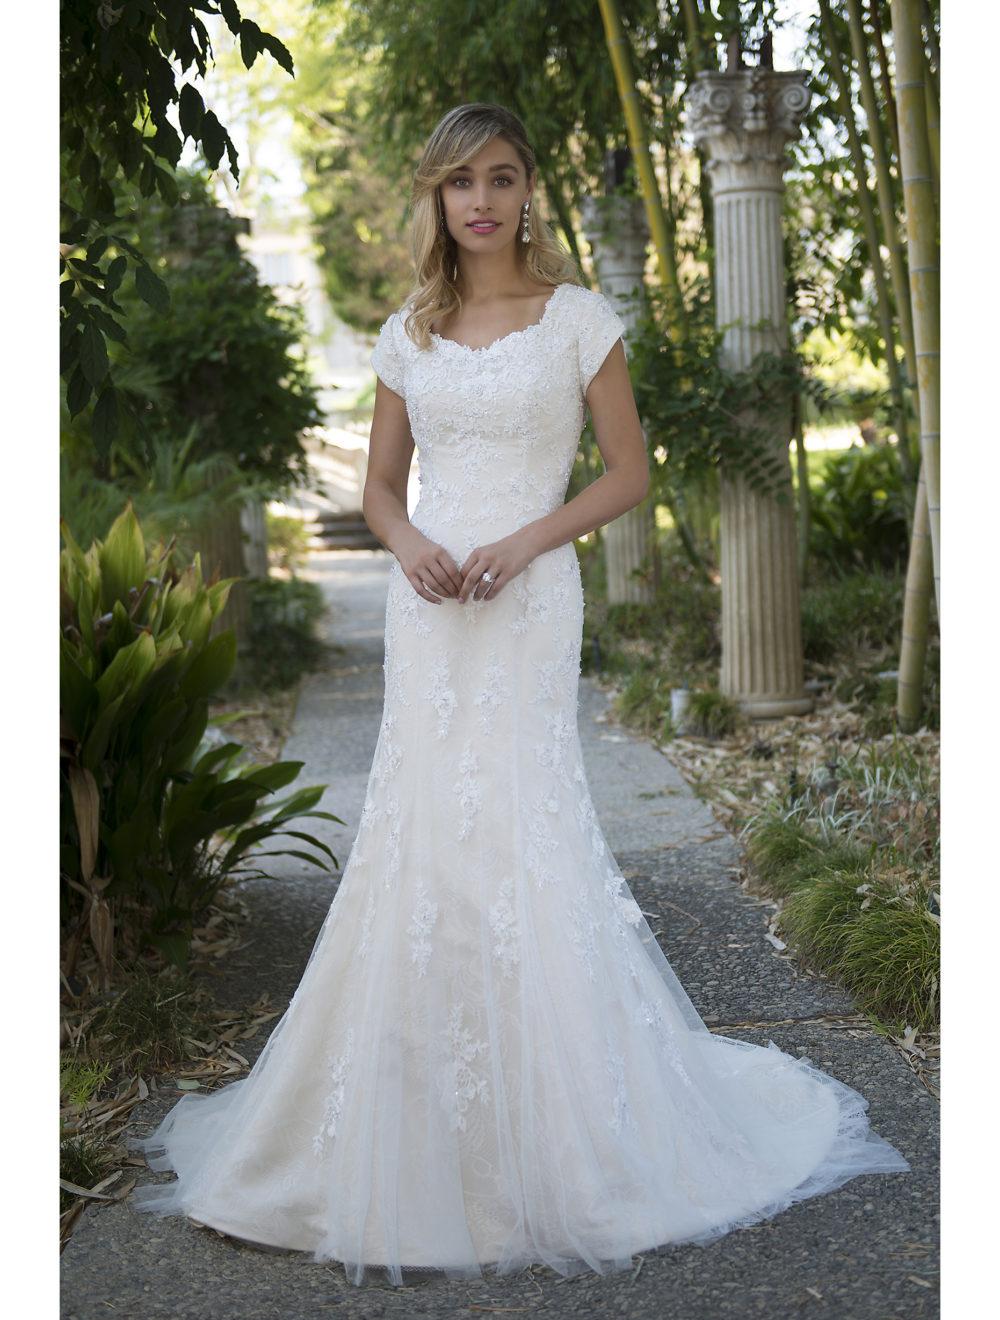 Vintage Champagne Lace Mermaid Modest Wedding Dresses 2019 Cap Sleeves Wedding Gowns Robe De Mariage Couture Vestido De Noiva October 2020